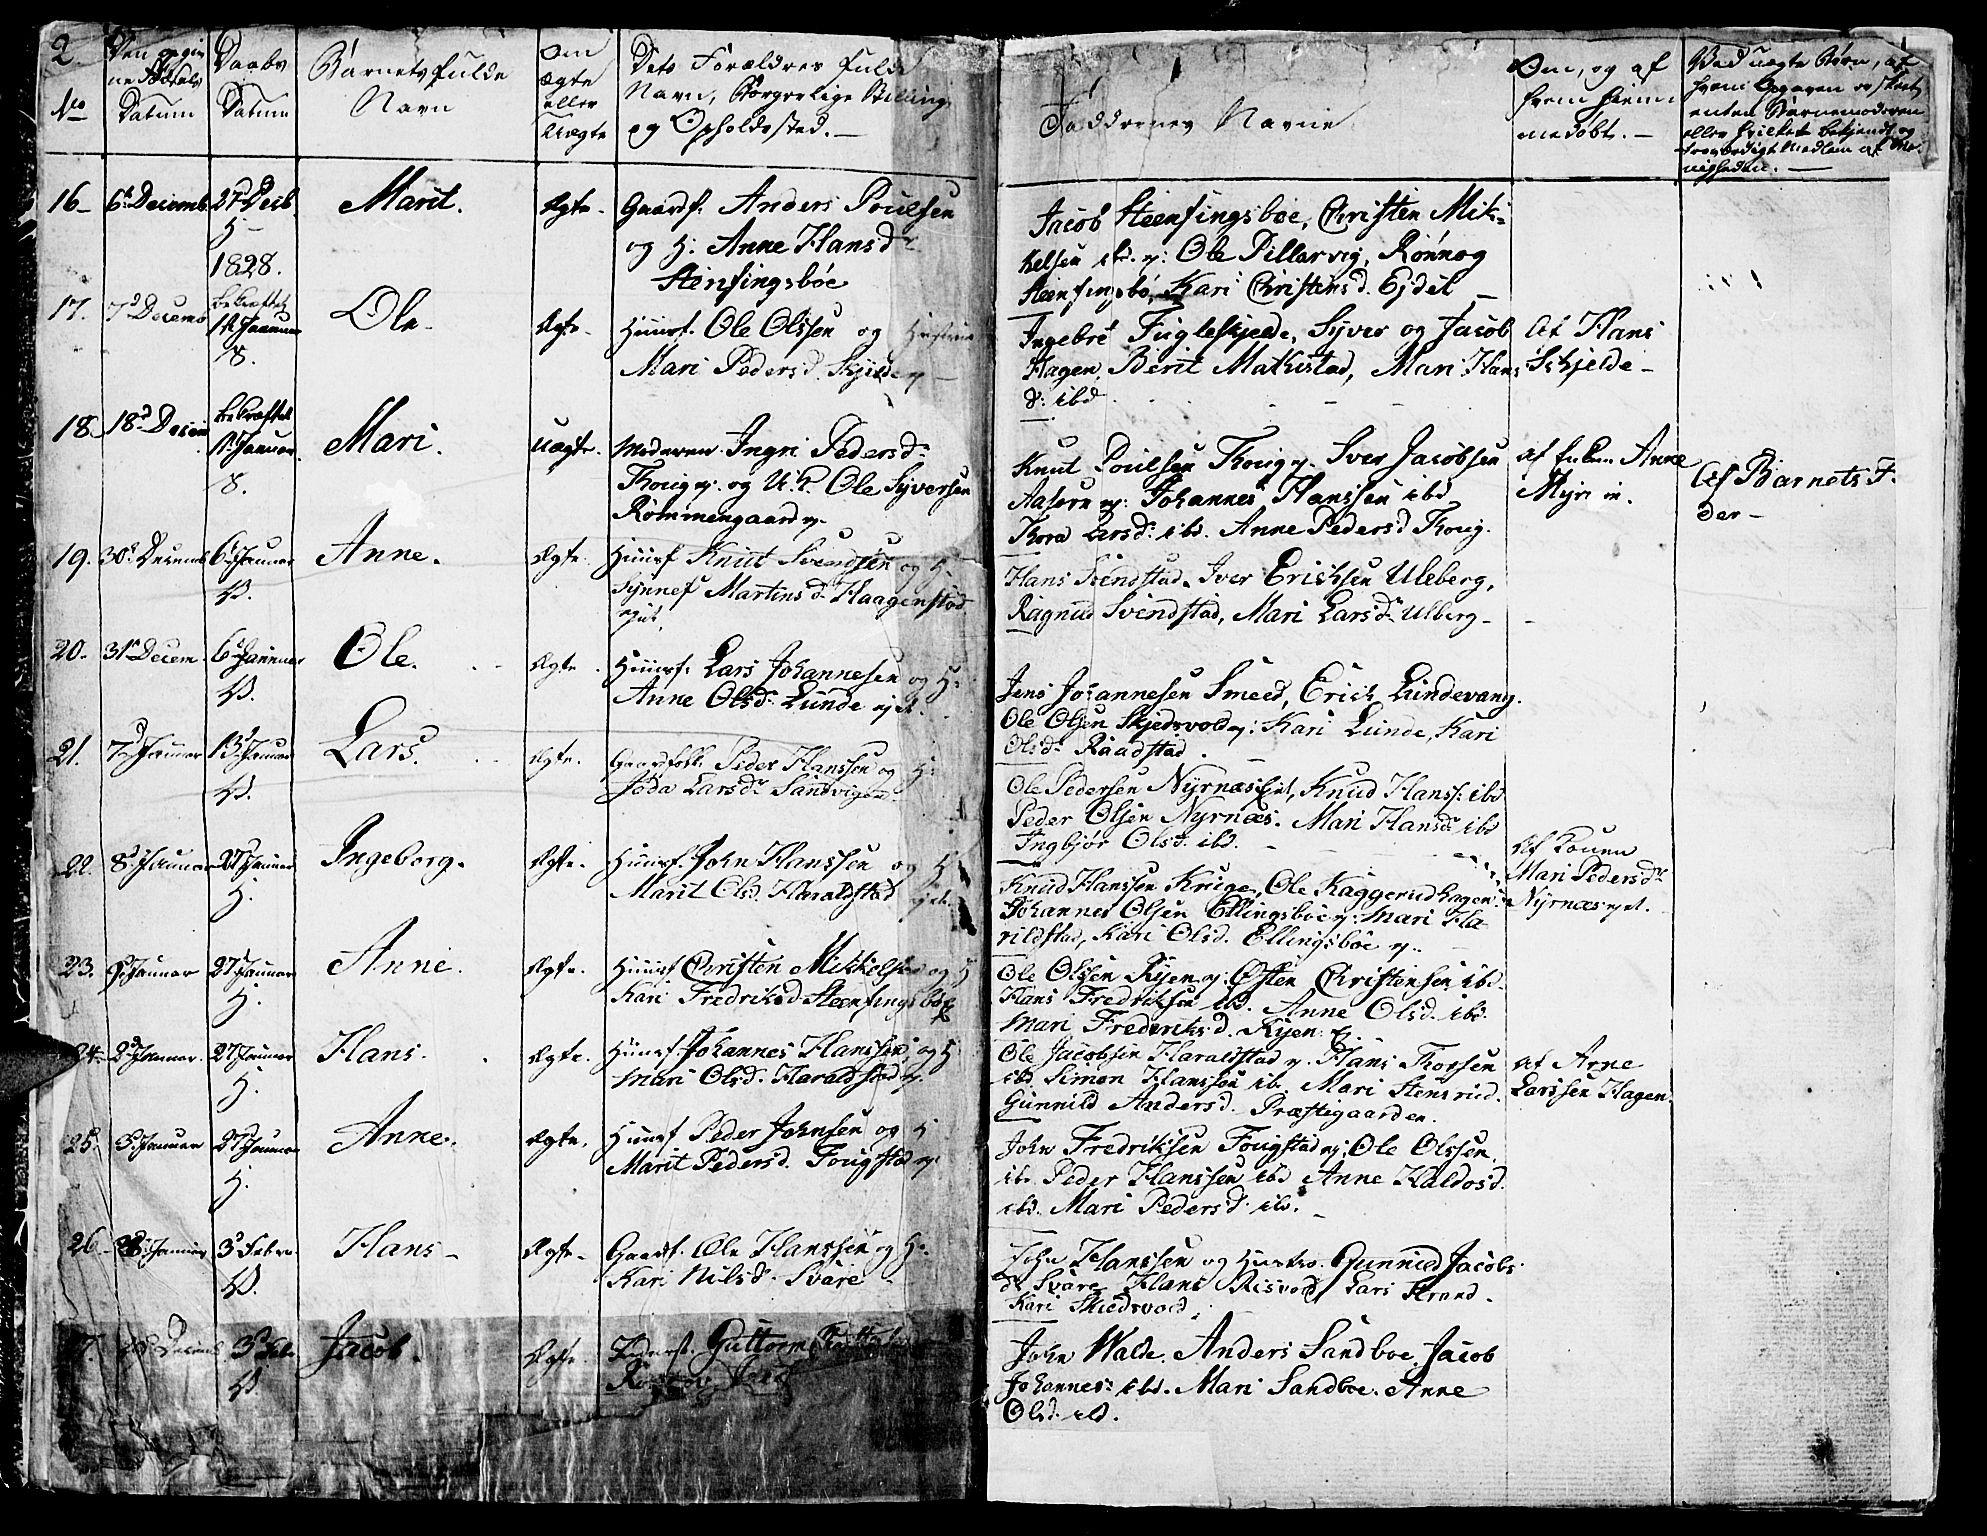 SAH, Vågå prestekontor, Ministerialbok nr. 4 /1, 1827-1842, s. 2